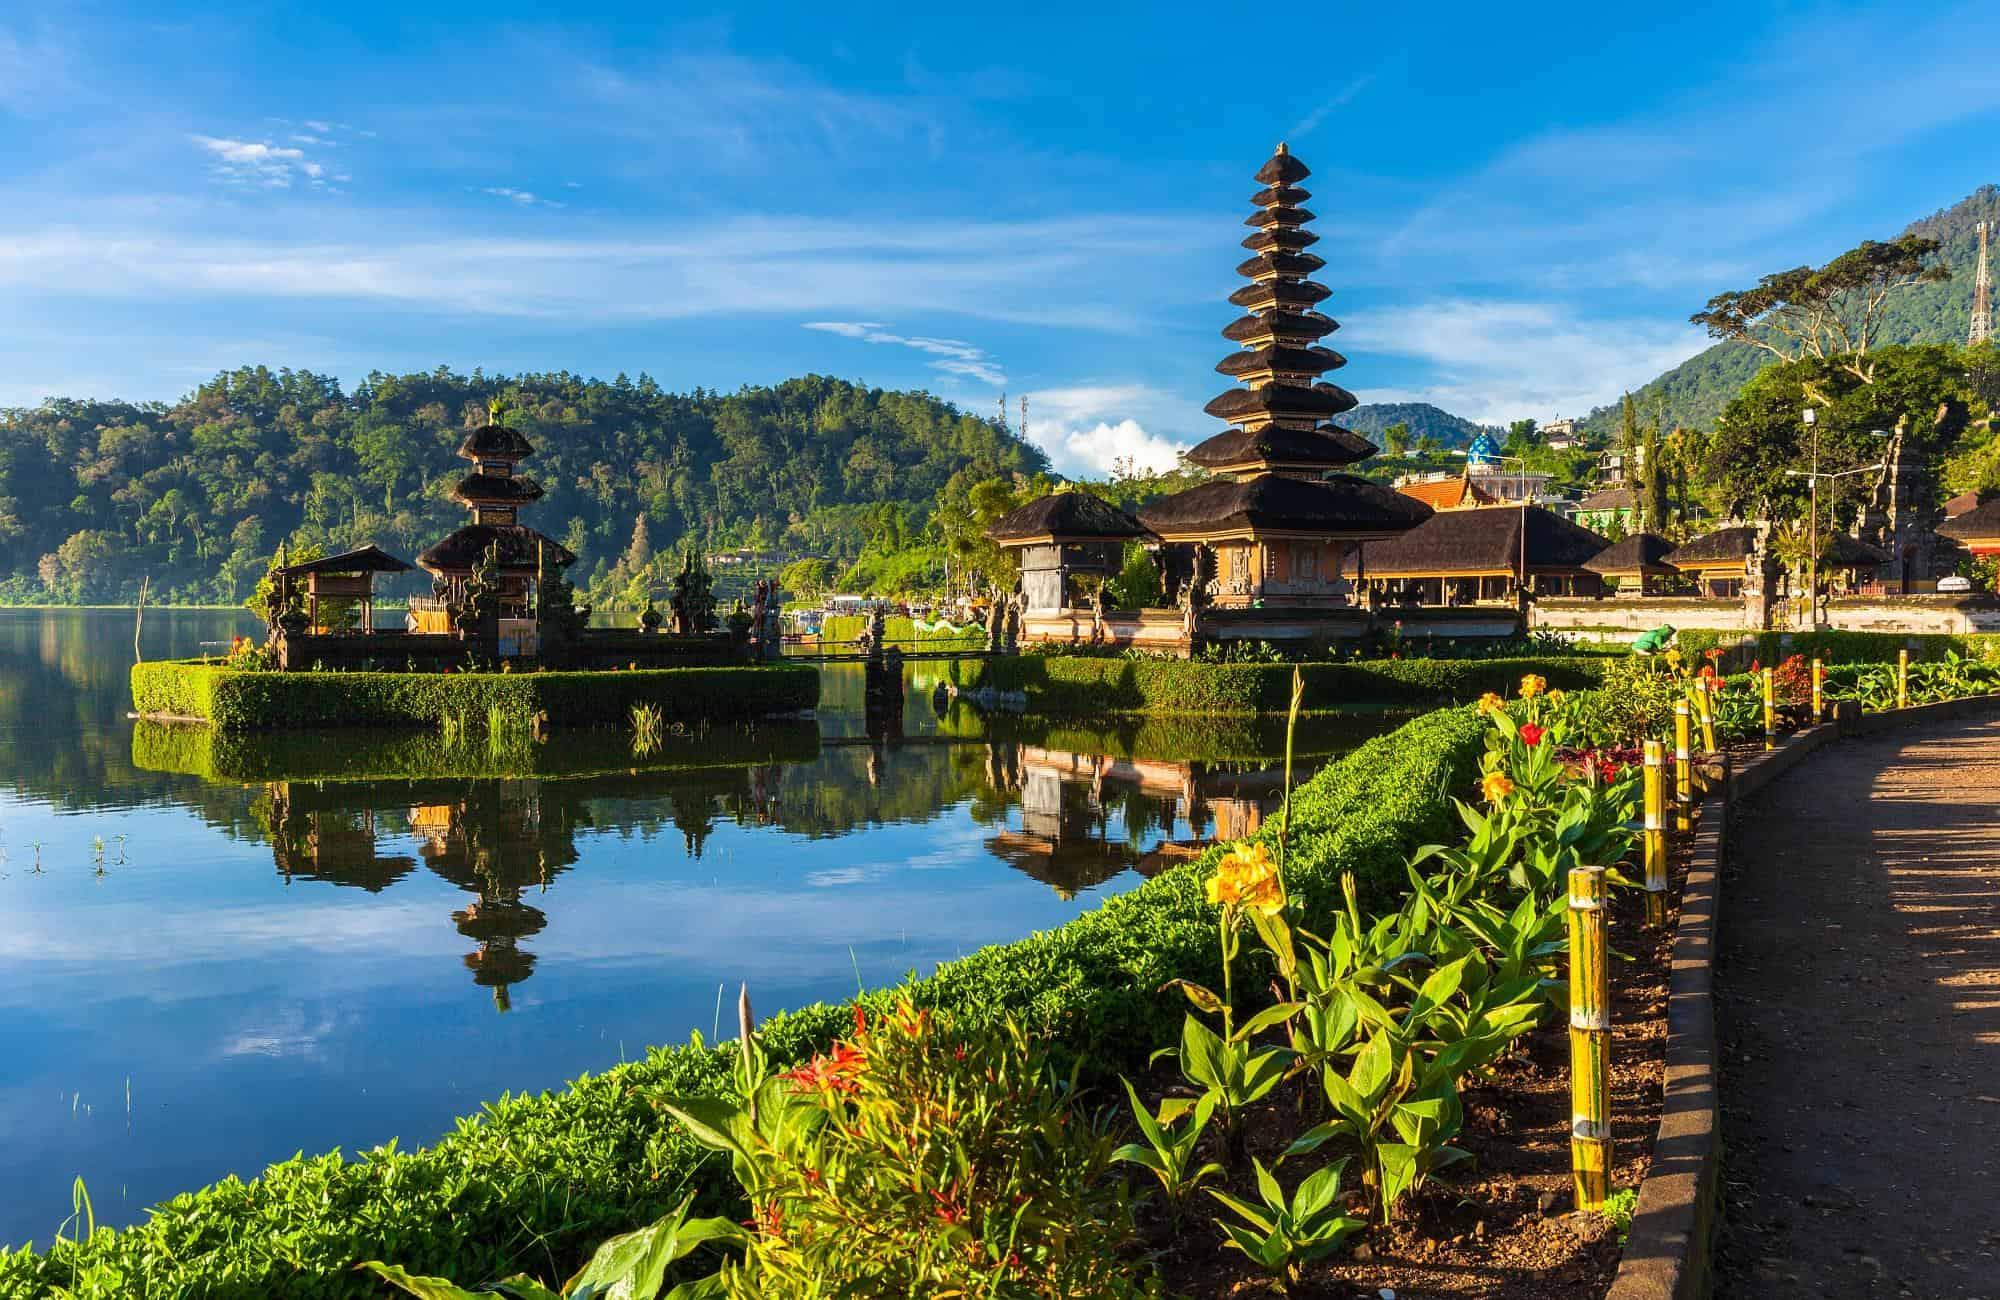 Voyage en Indonésie - Bali - Amplitudes